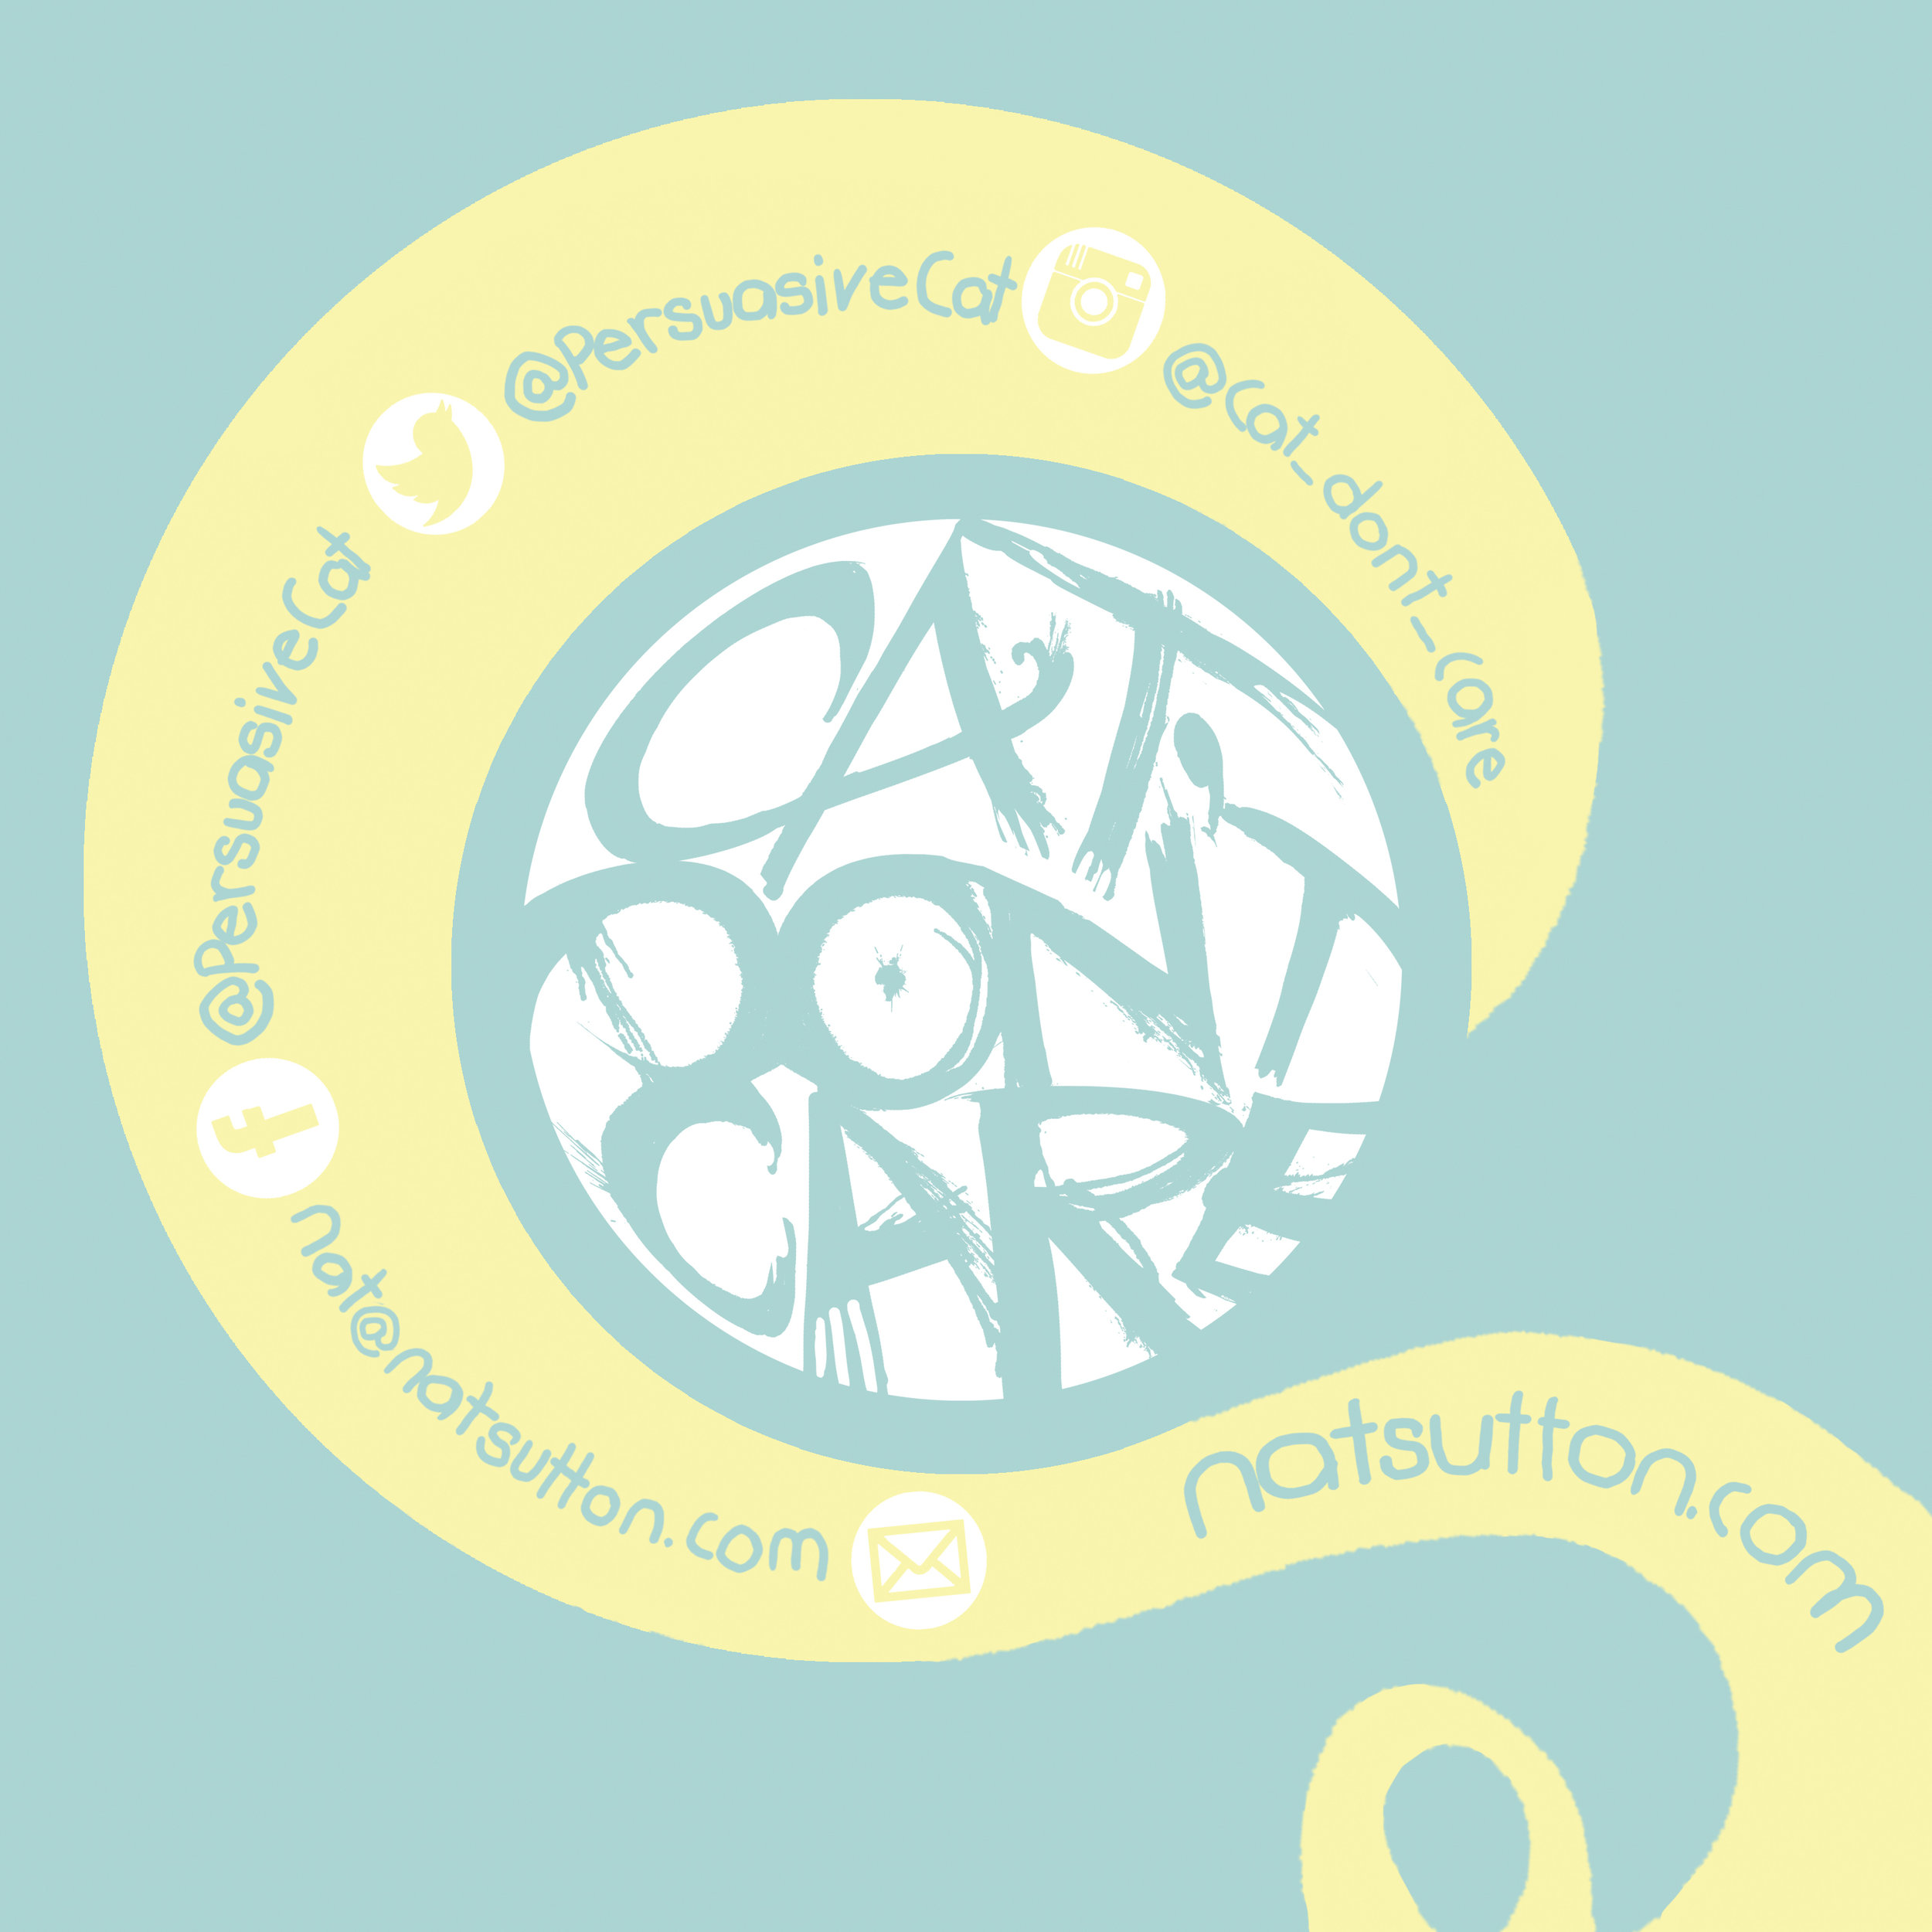 Natalie Palmer Sutton | Cat Don't Care | Art & illustration